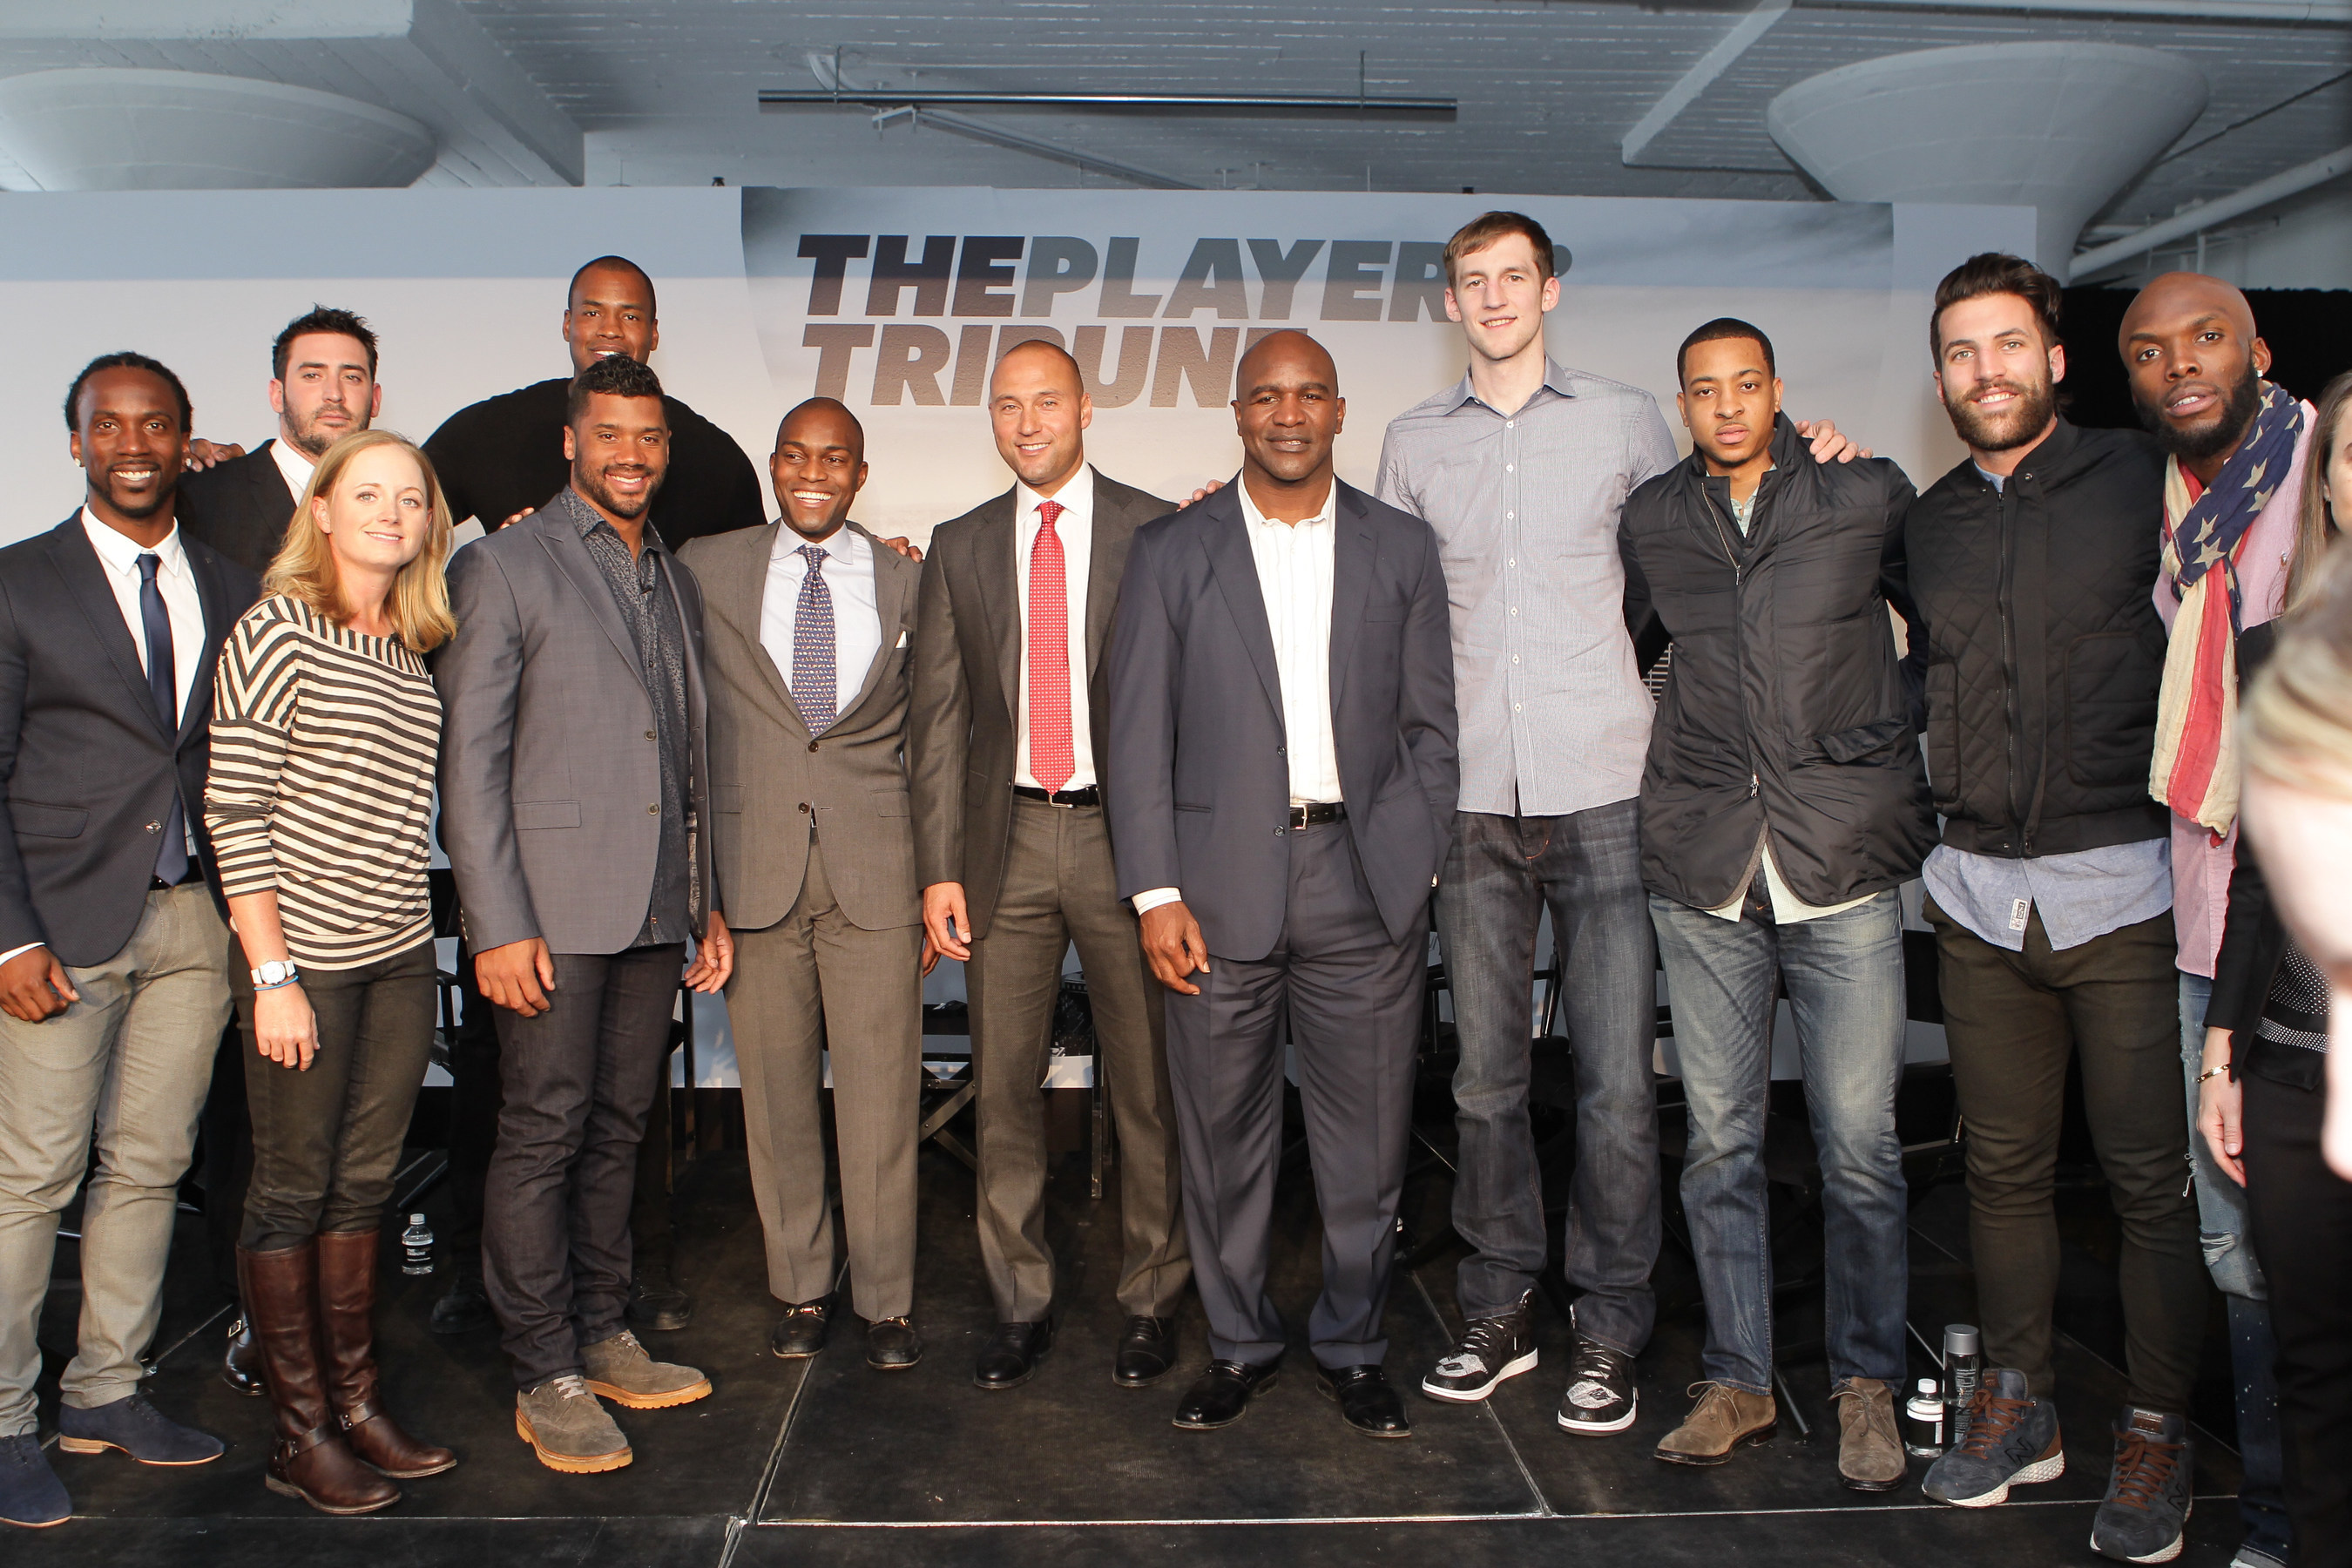 Derek Jeter, Russell Wilson, Evander Holyfield, Matt Harvey and Other Contributors Present The Next Evolution Of The Players' Tribune